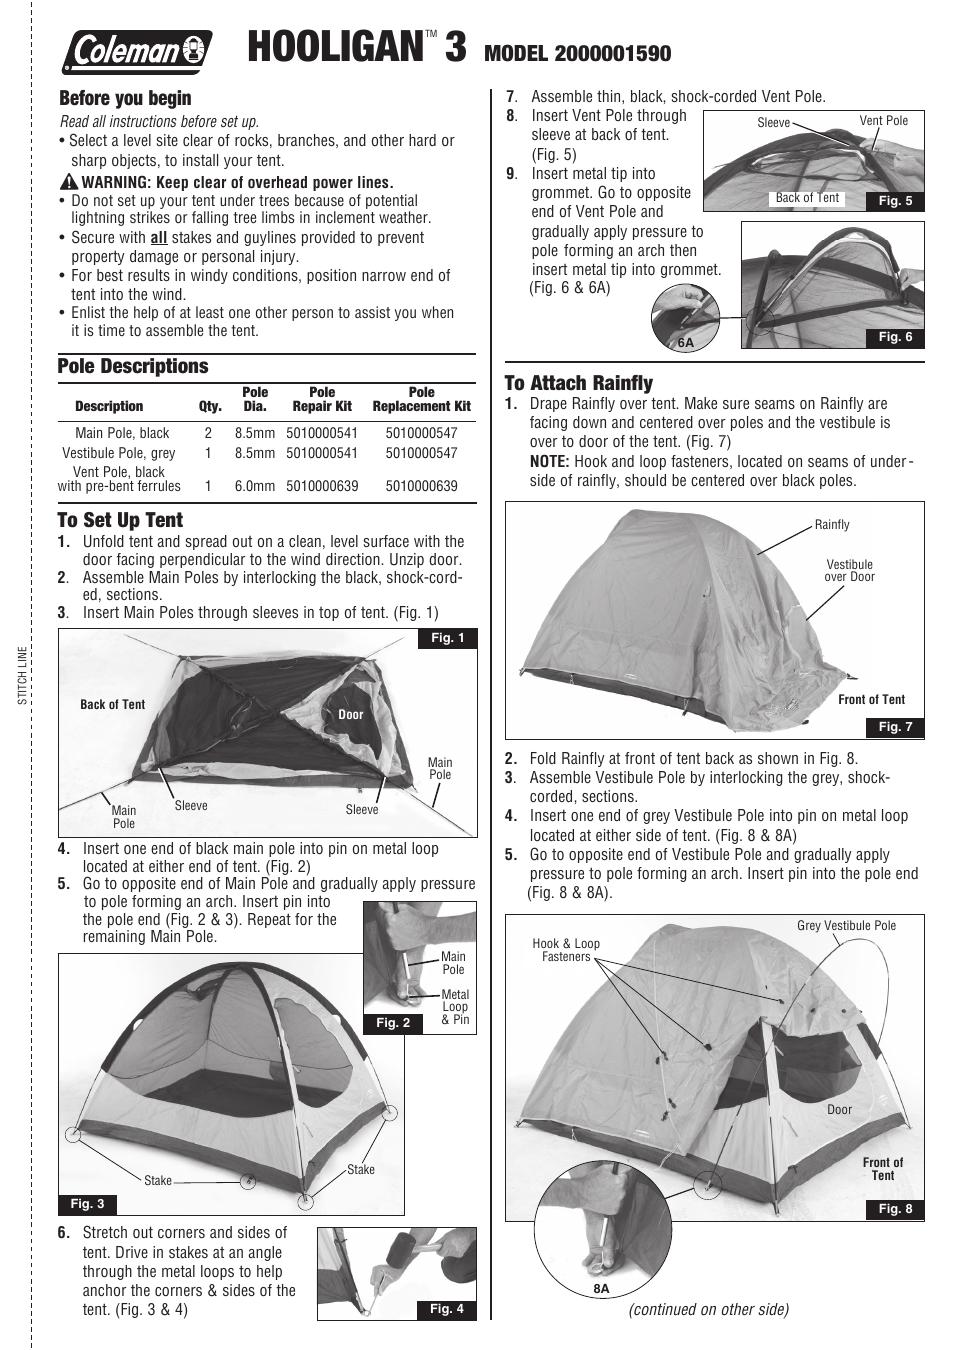 sc 1 st  manualsdir.com & Coleman HOOLIGAN 3 2000001590 User Manual | 2 pages